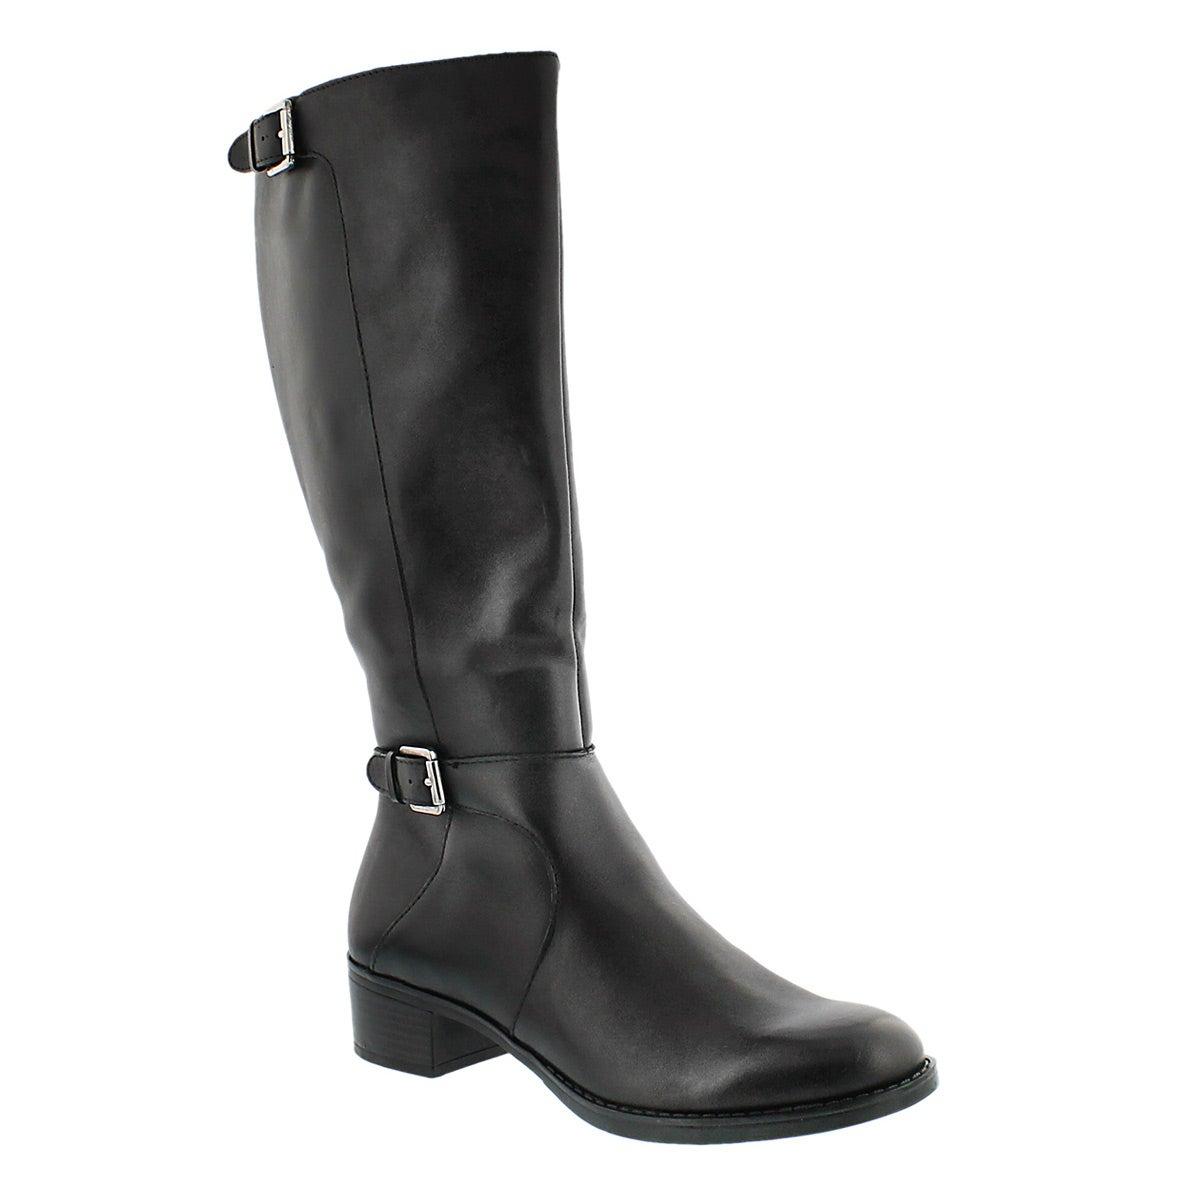 Lds Chilled blk wide shaft dress boot